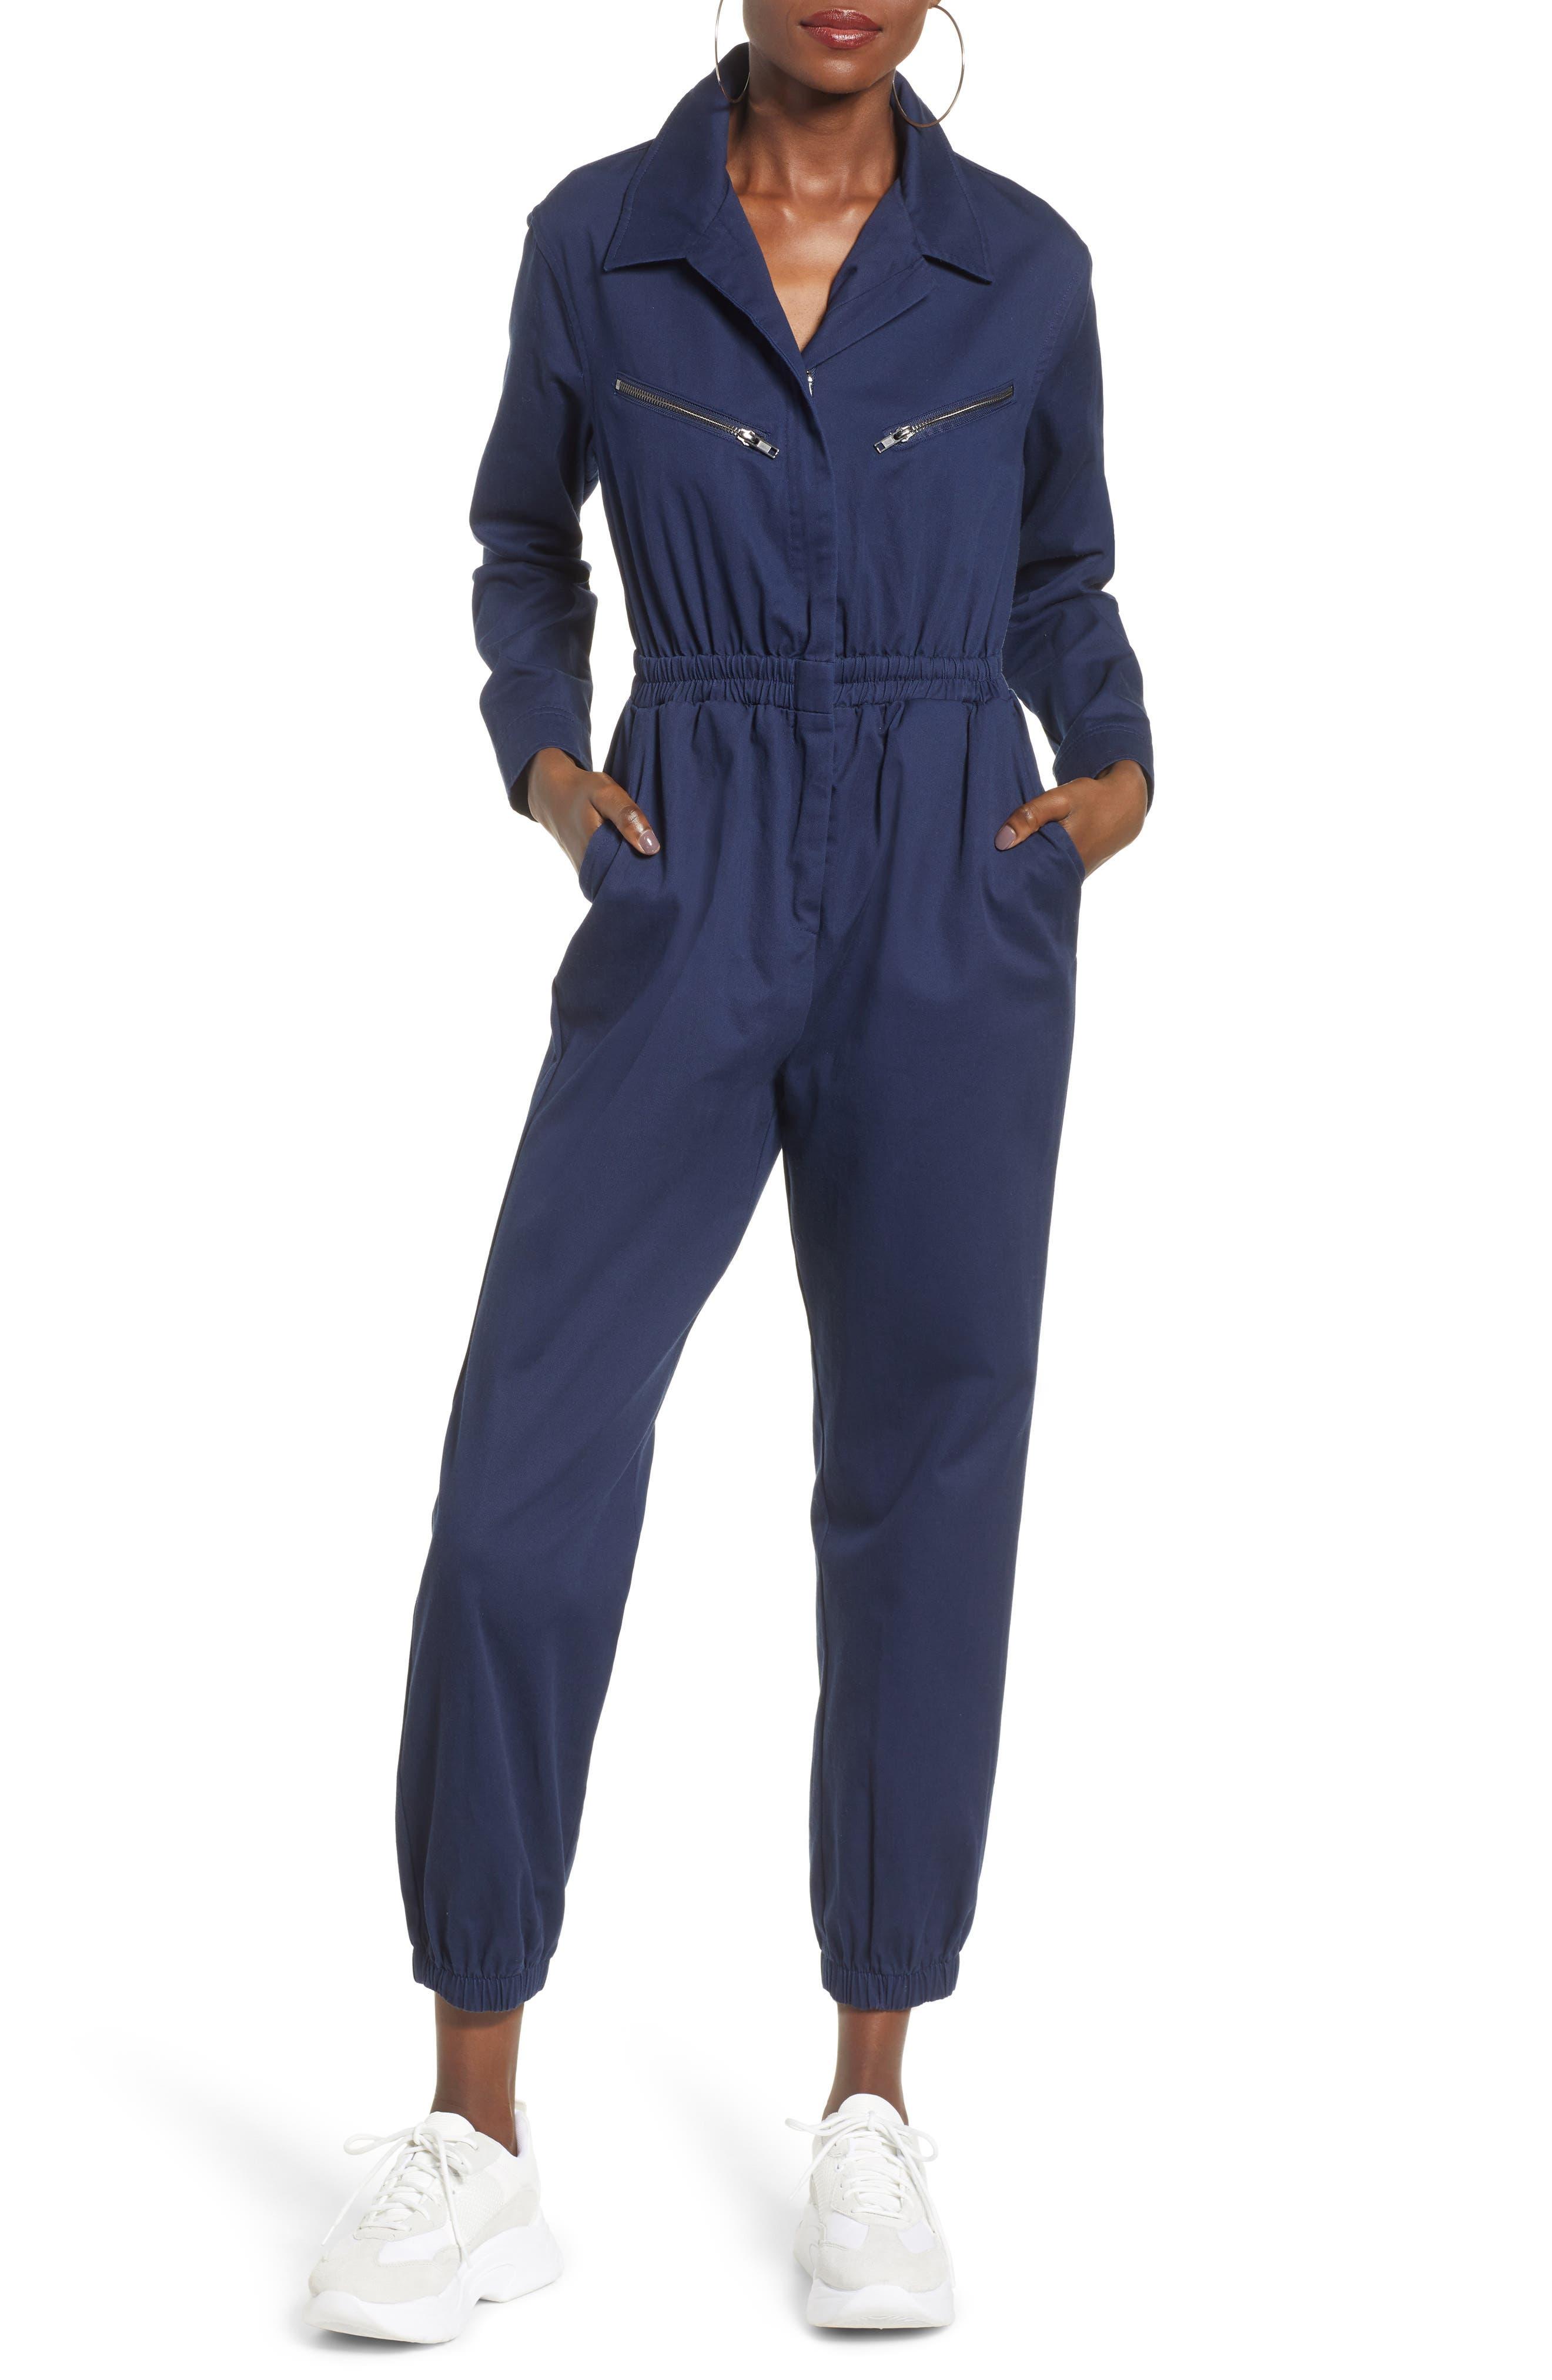 TEN SIXTY SHERMAN Twill Workwear Jumpsuit, Main, color, OXFORD BLUE